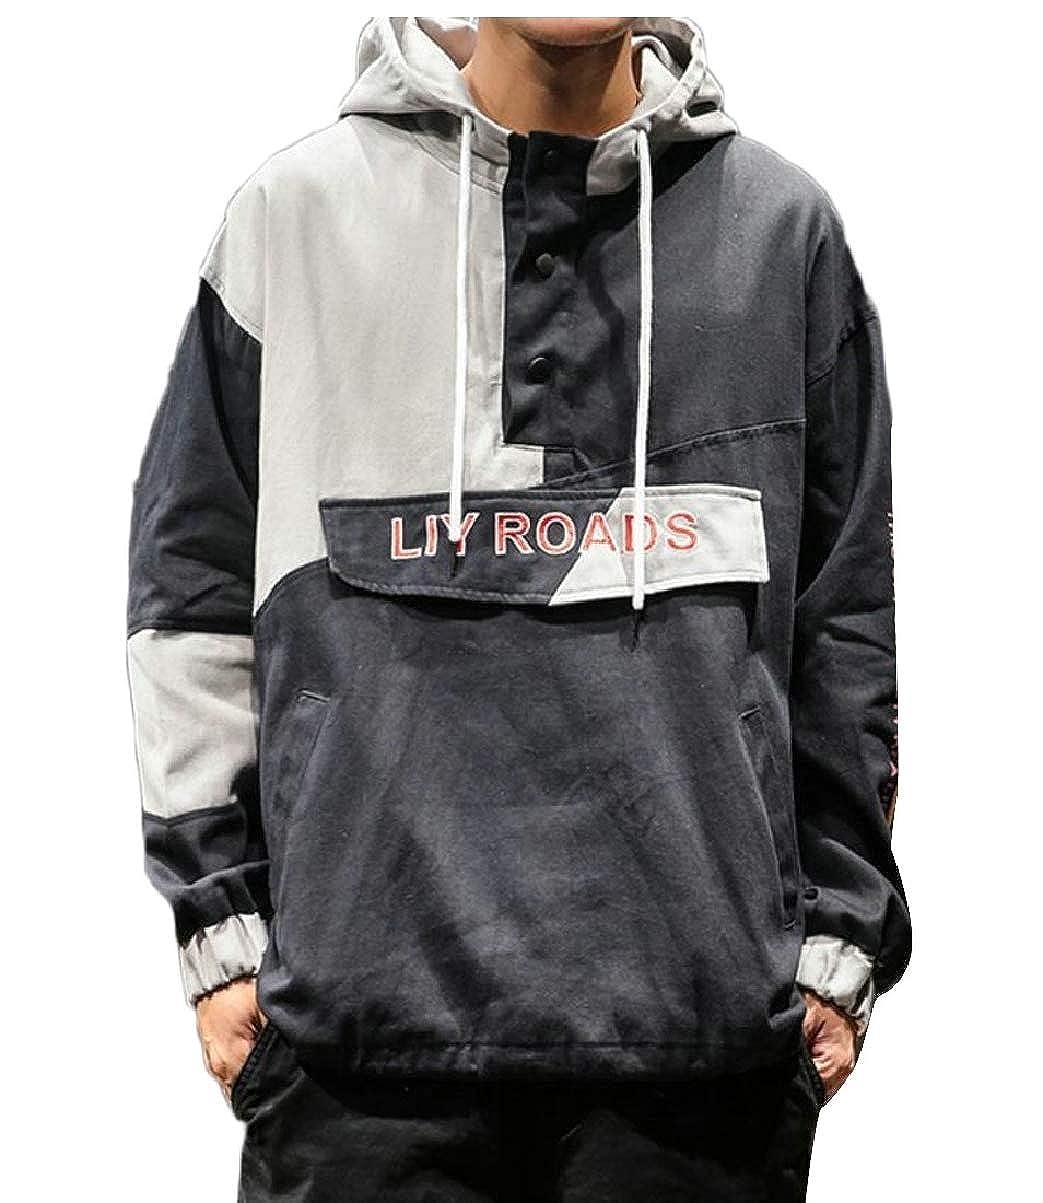 CBTLVSN Mens Hipster Hip Hop Letter Print Autumn Pullover Loose Hoodie Sweatshirt